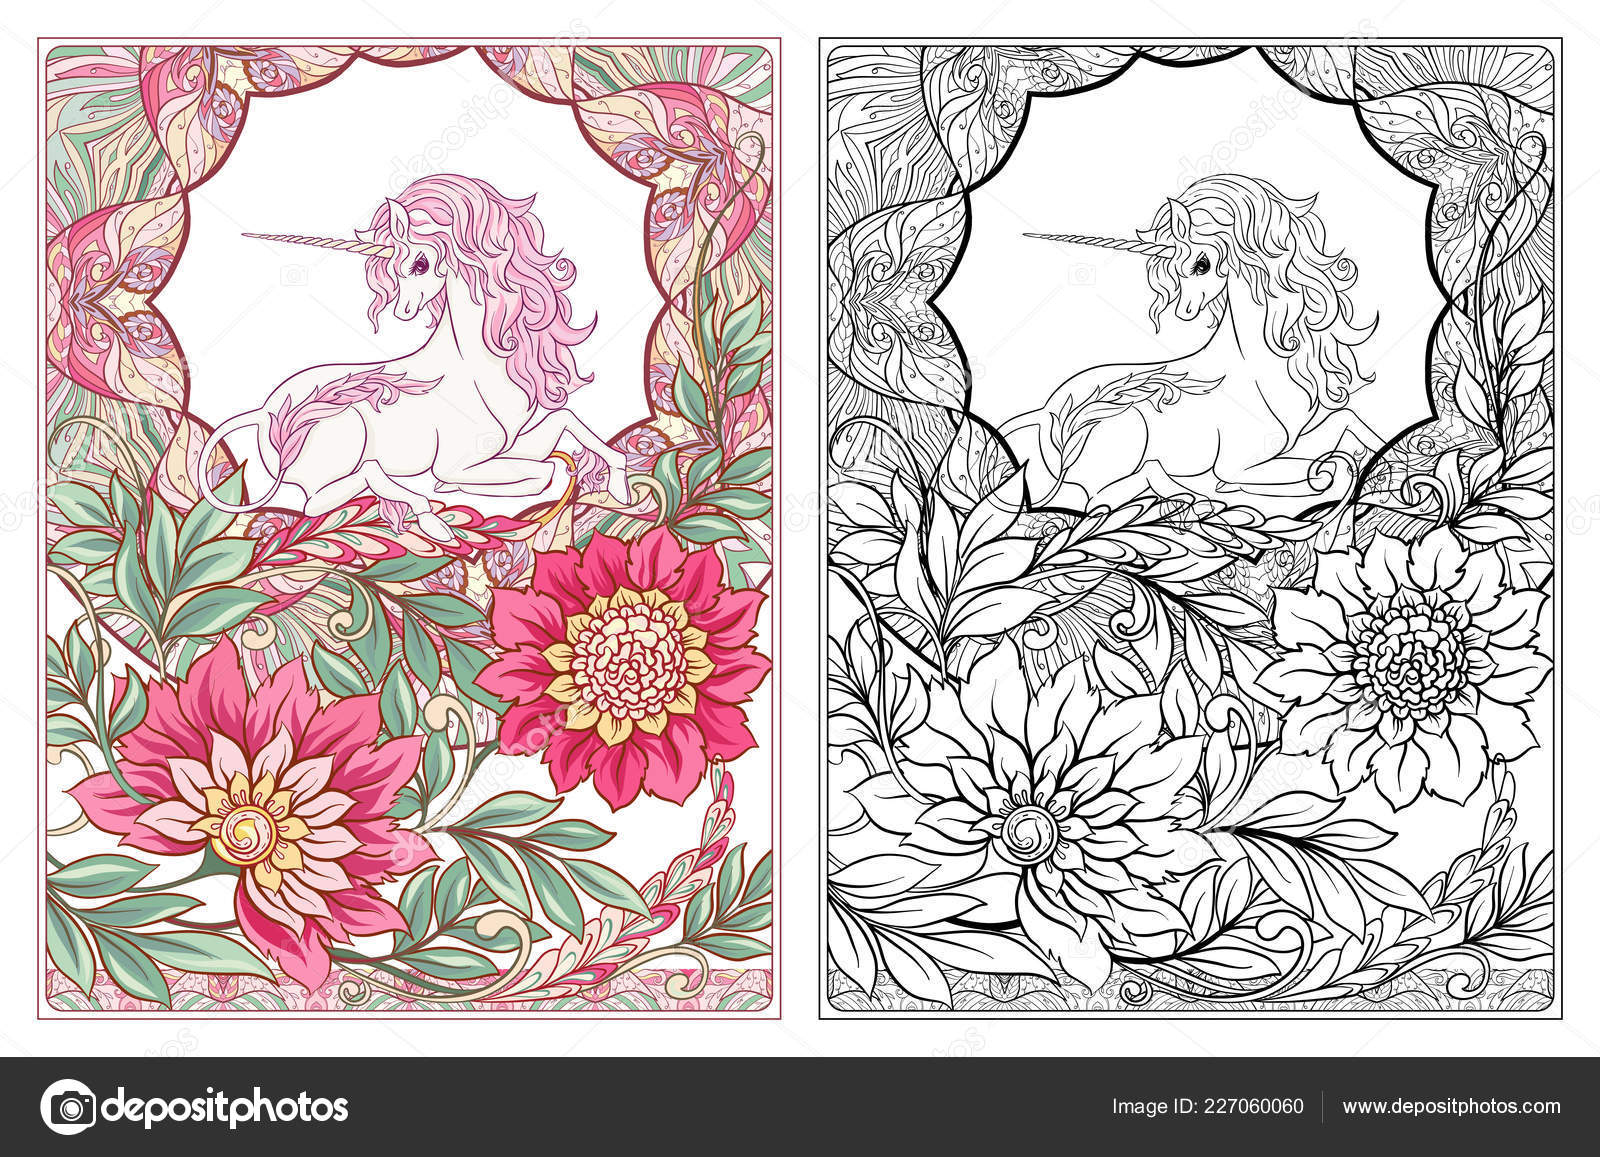 Marco Unicornio Vintage Flores Ilustracion Vector Estilo Art Nouveau